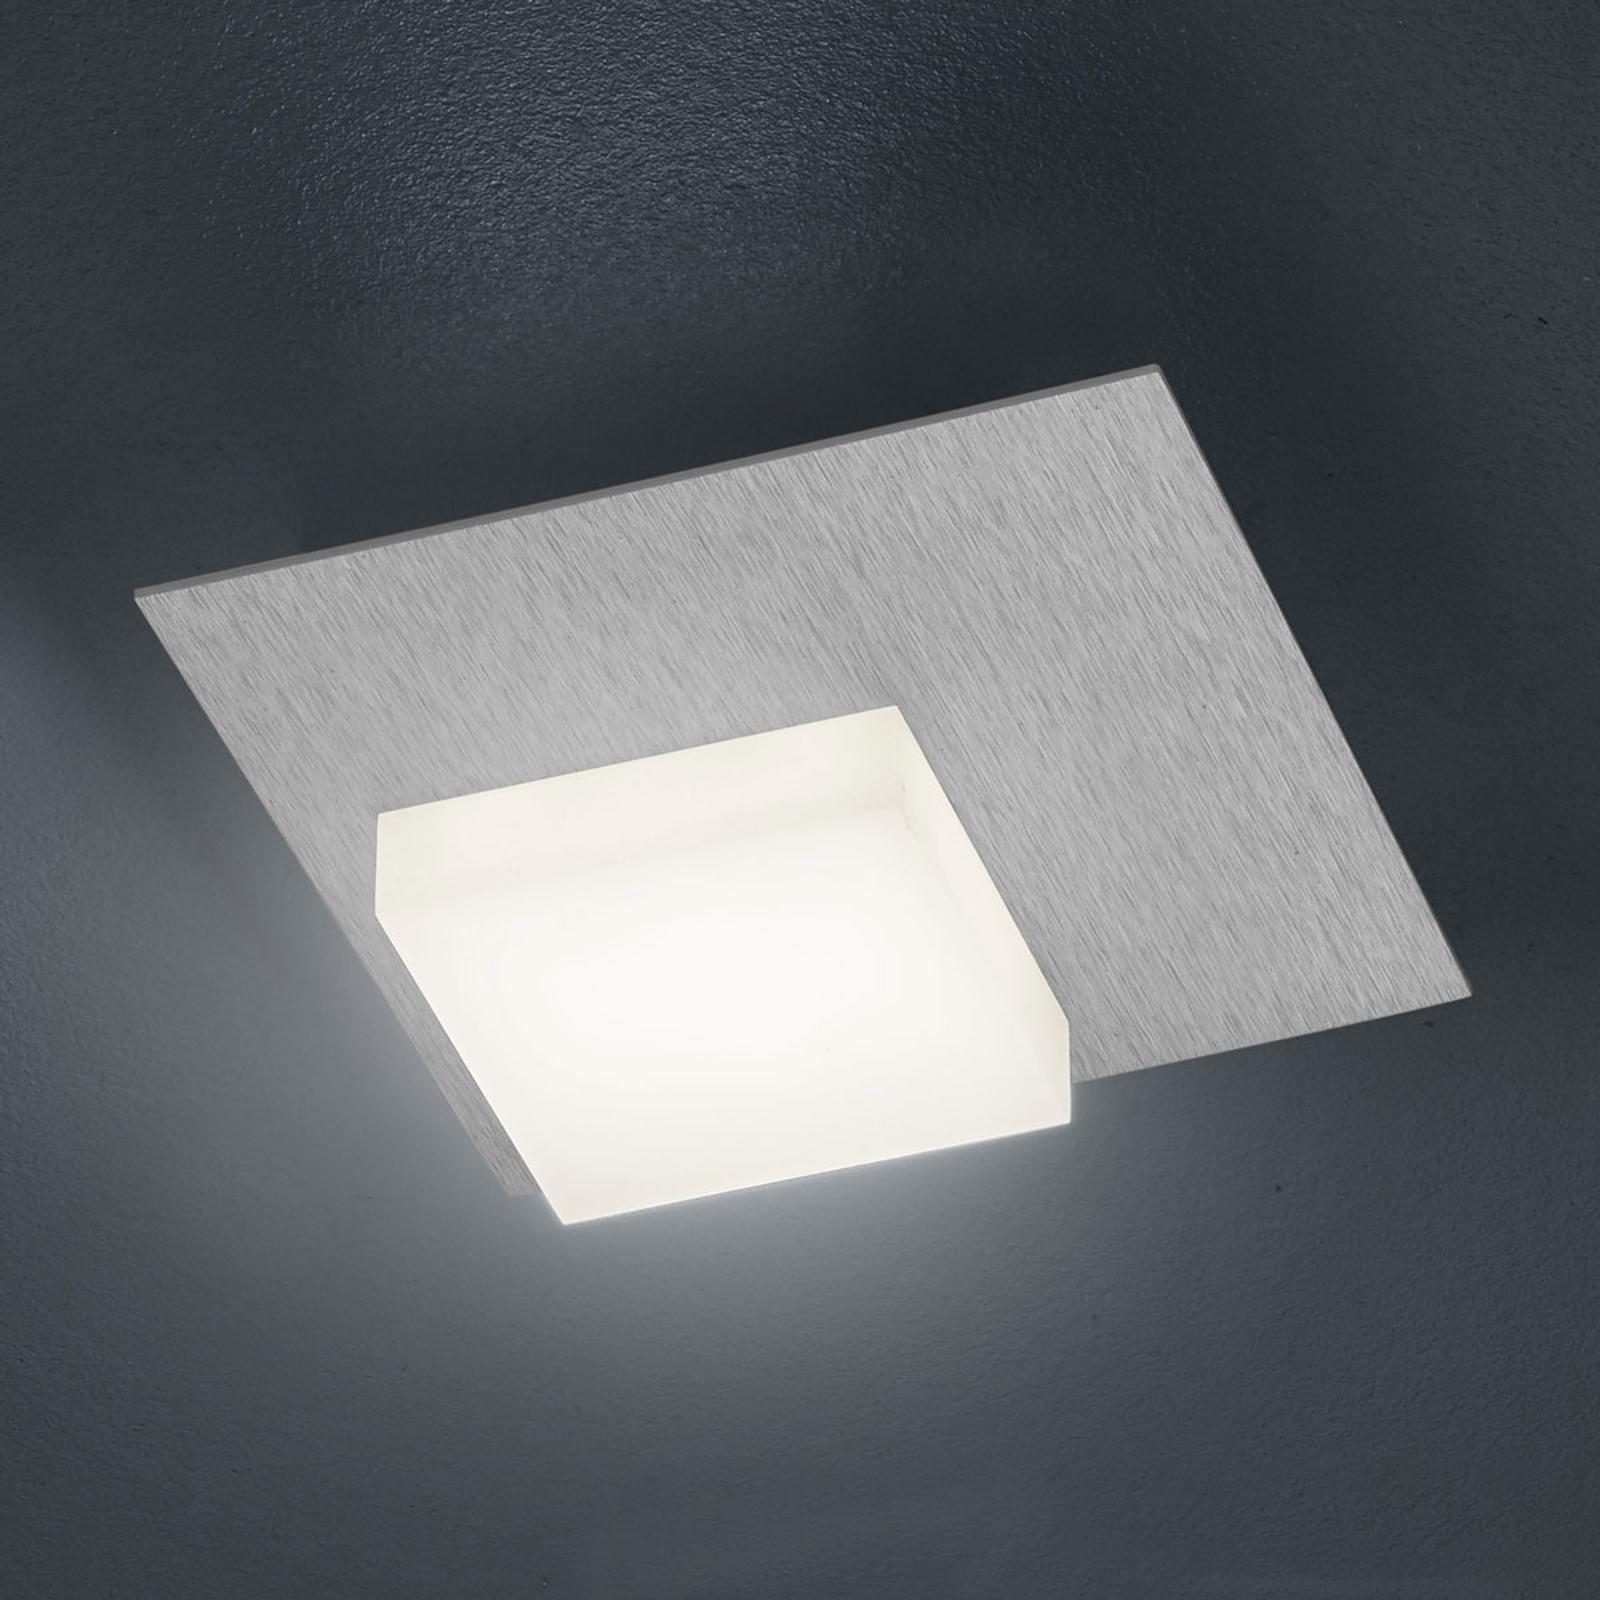 BANKAMP Cube LED-Deckenleuchte 8W, silber